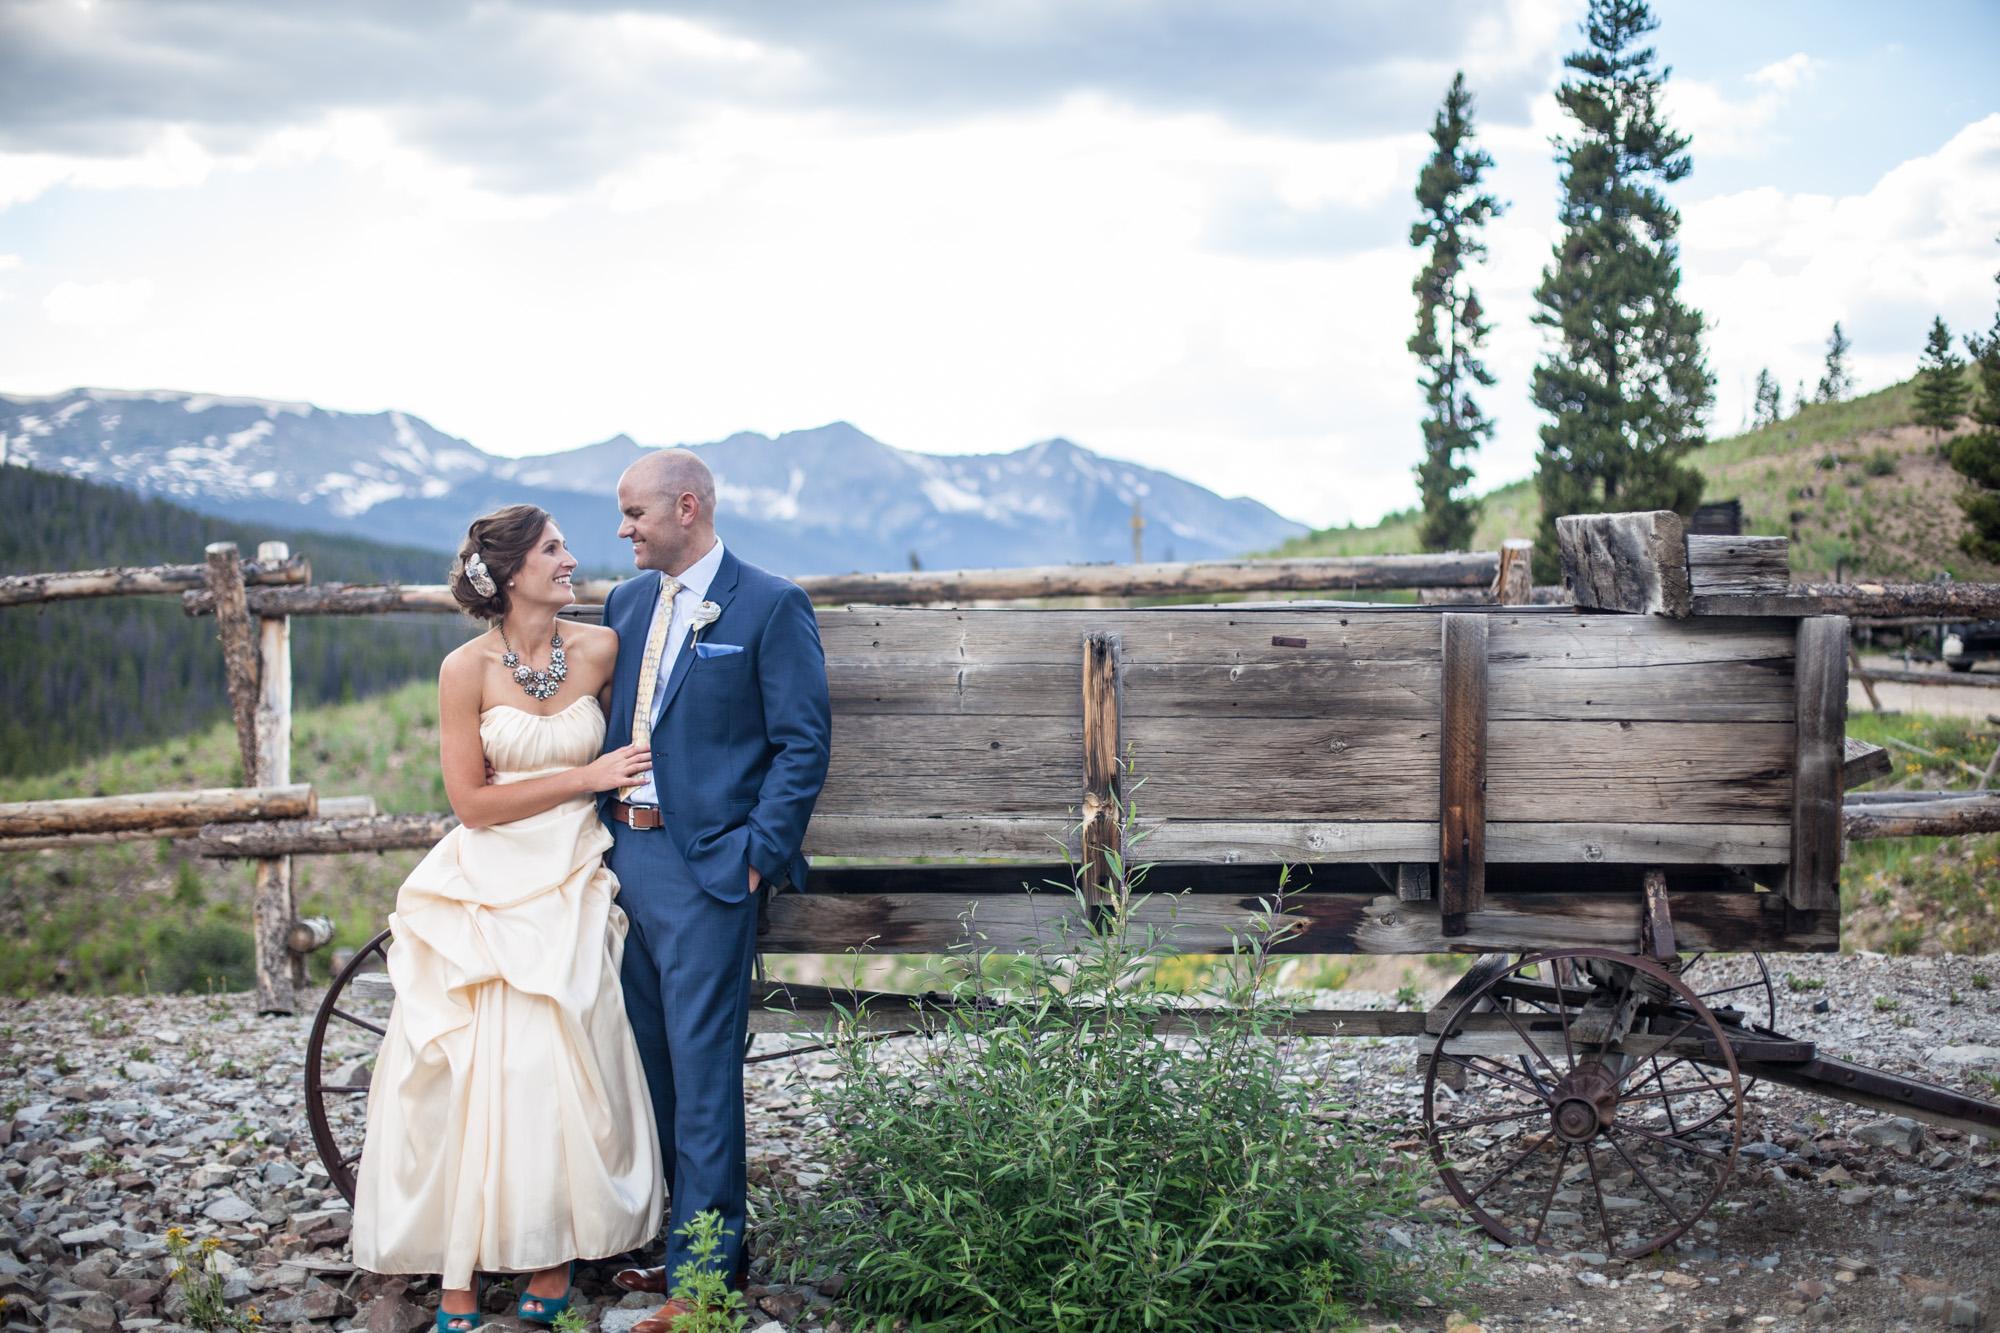 dry-gulch-placer-breckenridge-wedding-painter-ben-keys-wed-on-canvas-mountain-colorado-wedding